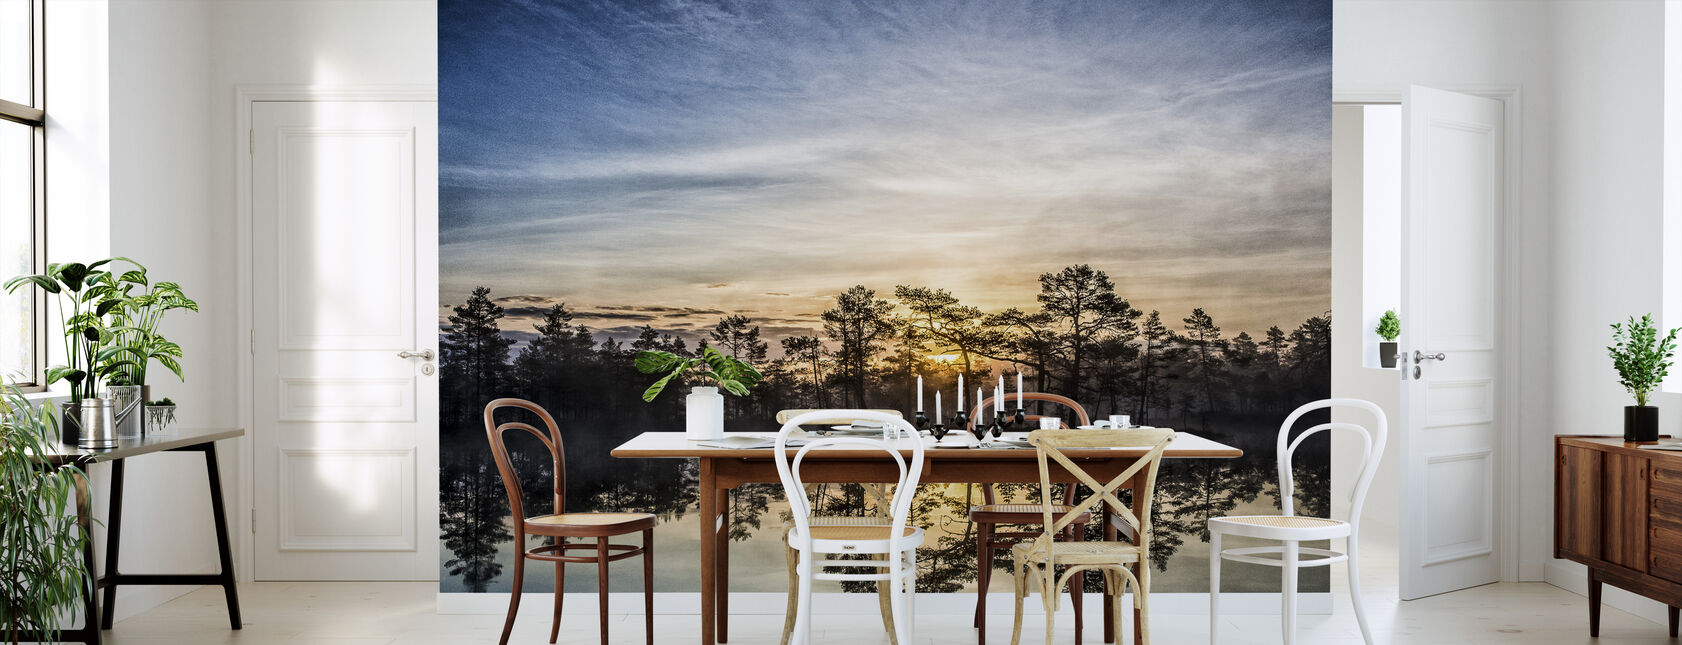 Lago en Hällefors - Suecia - Papel pintado - Cocina